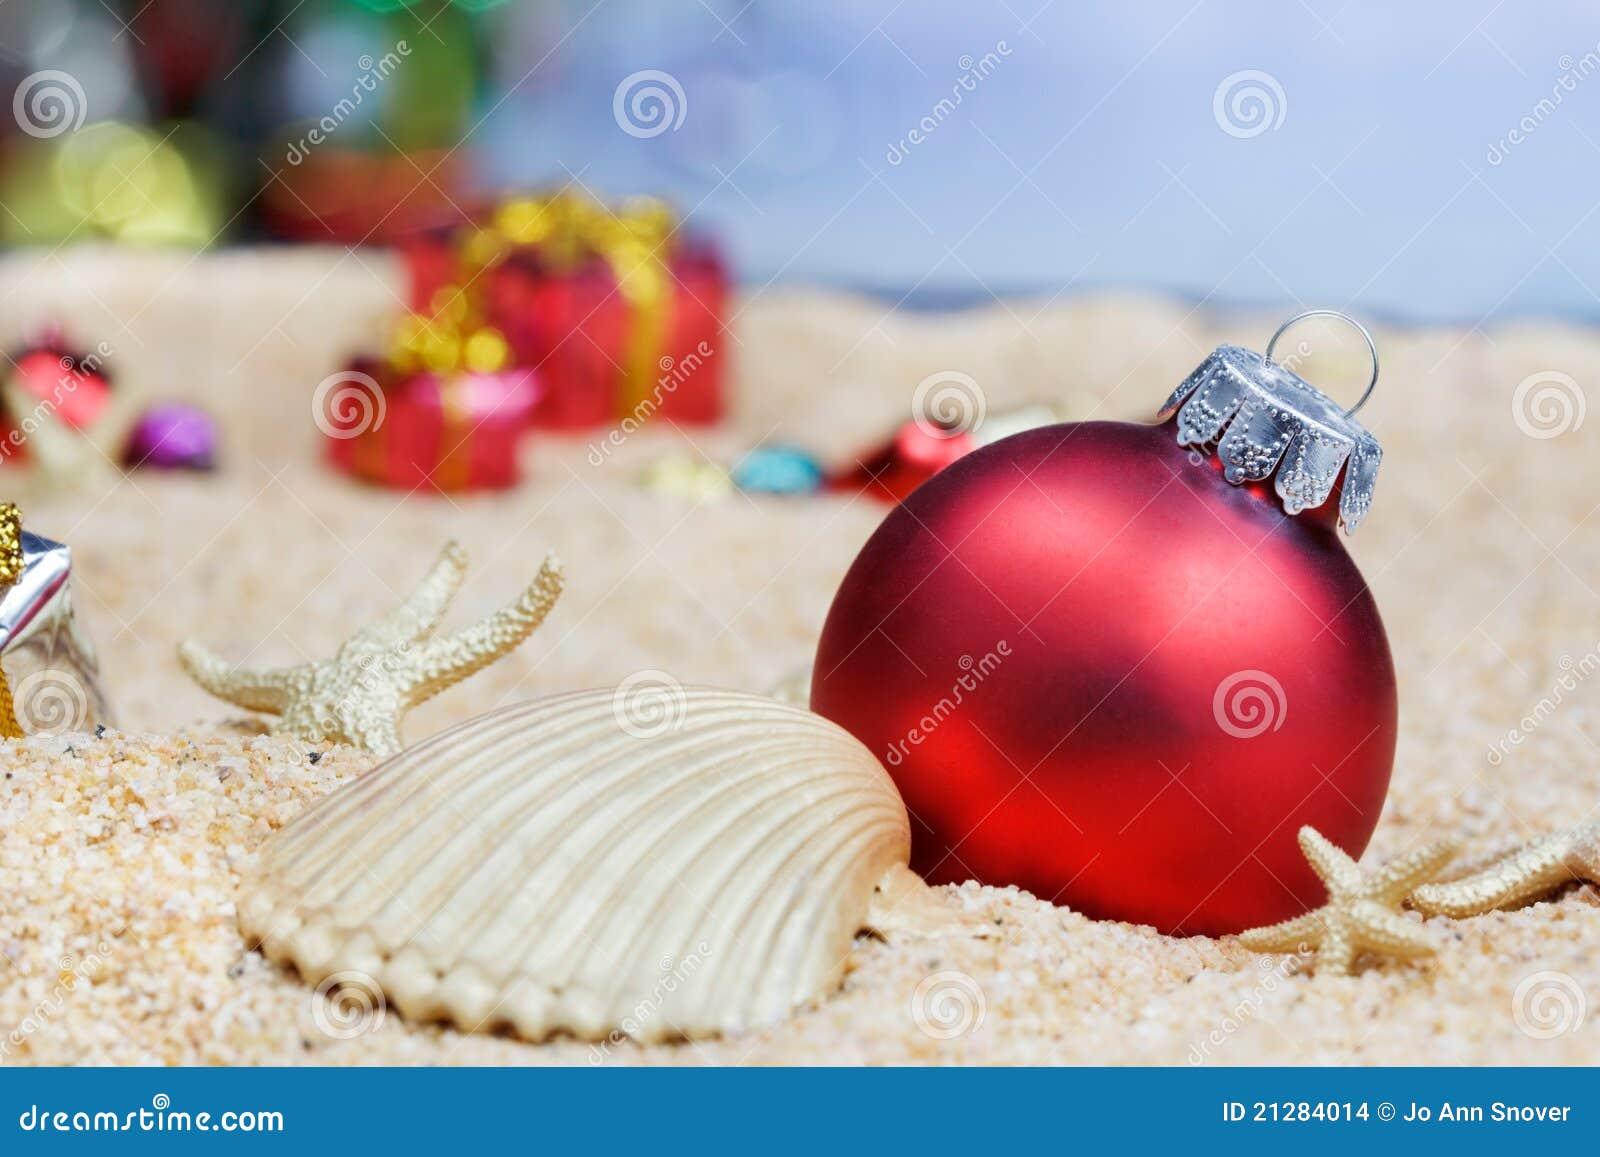 Beach Christmas Ornaments Stock Photo Image Of Beach 21284014